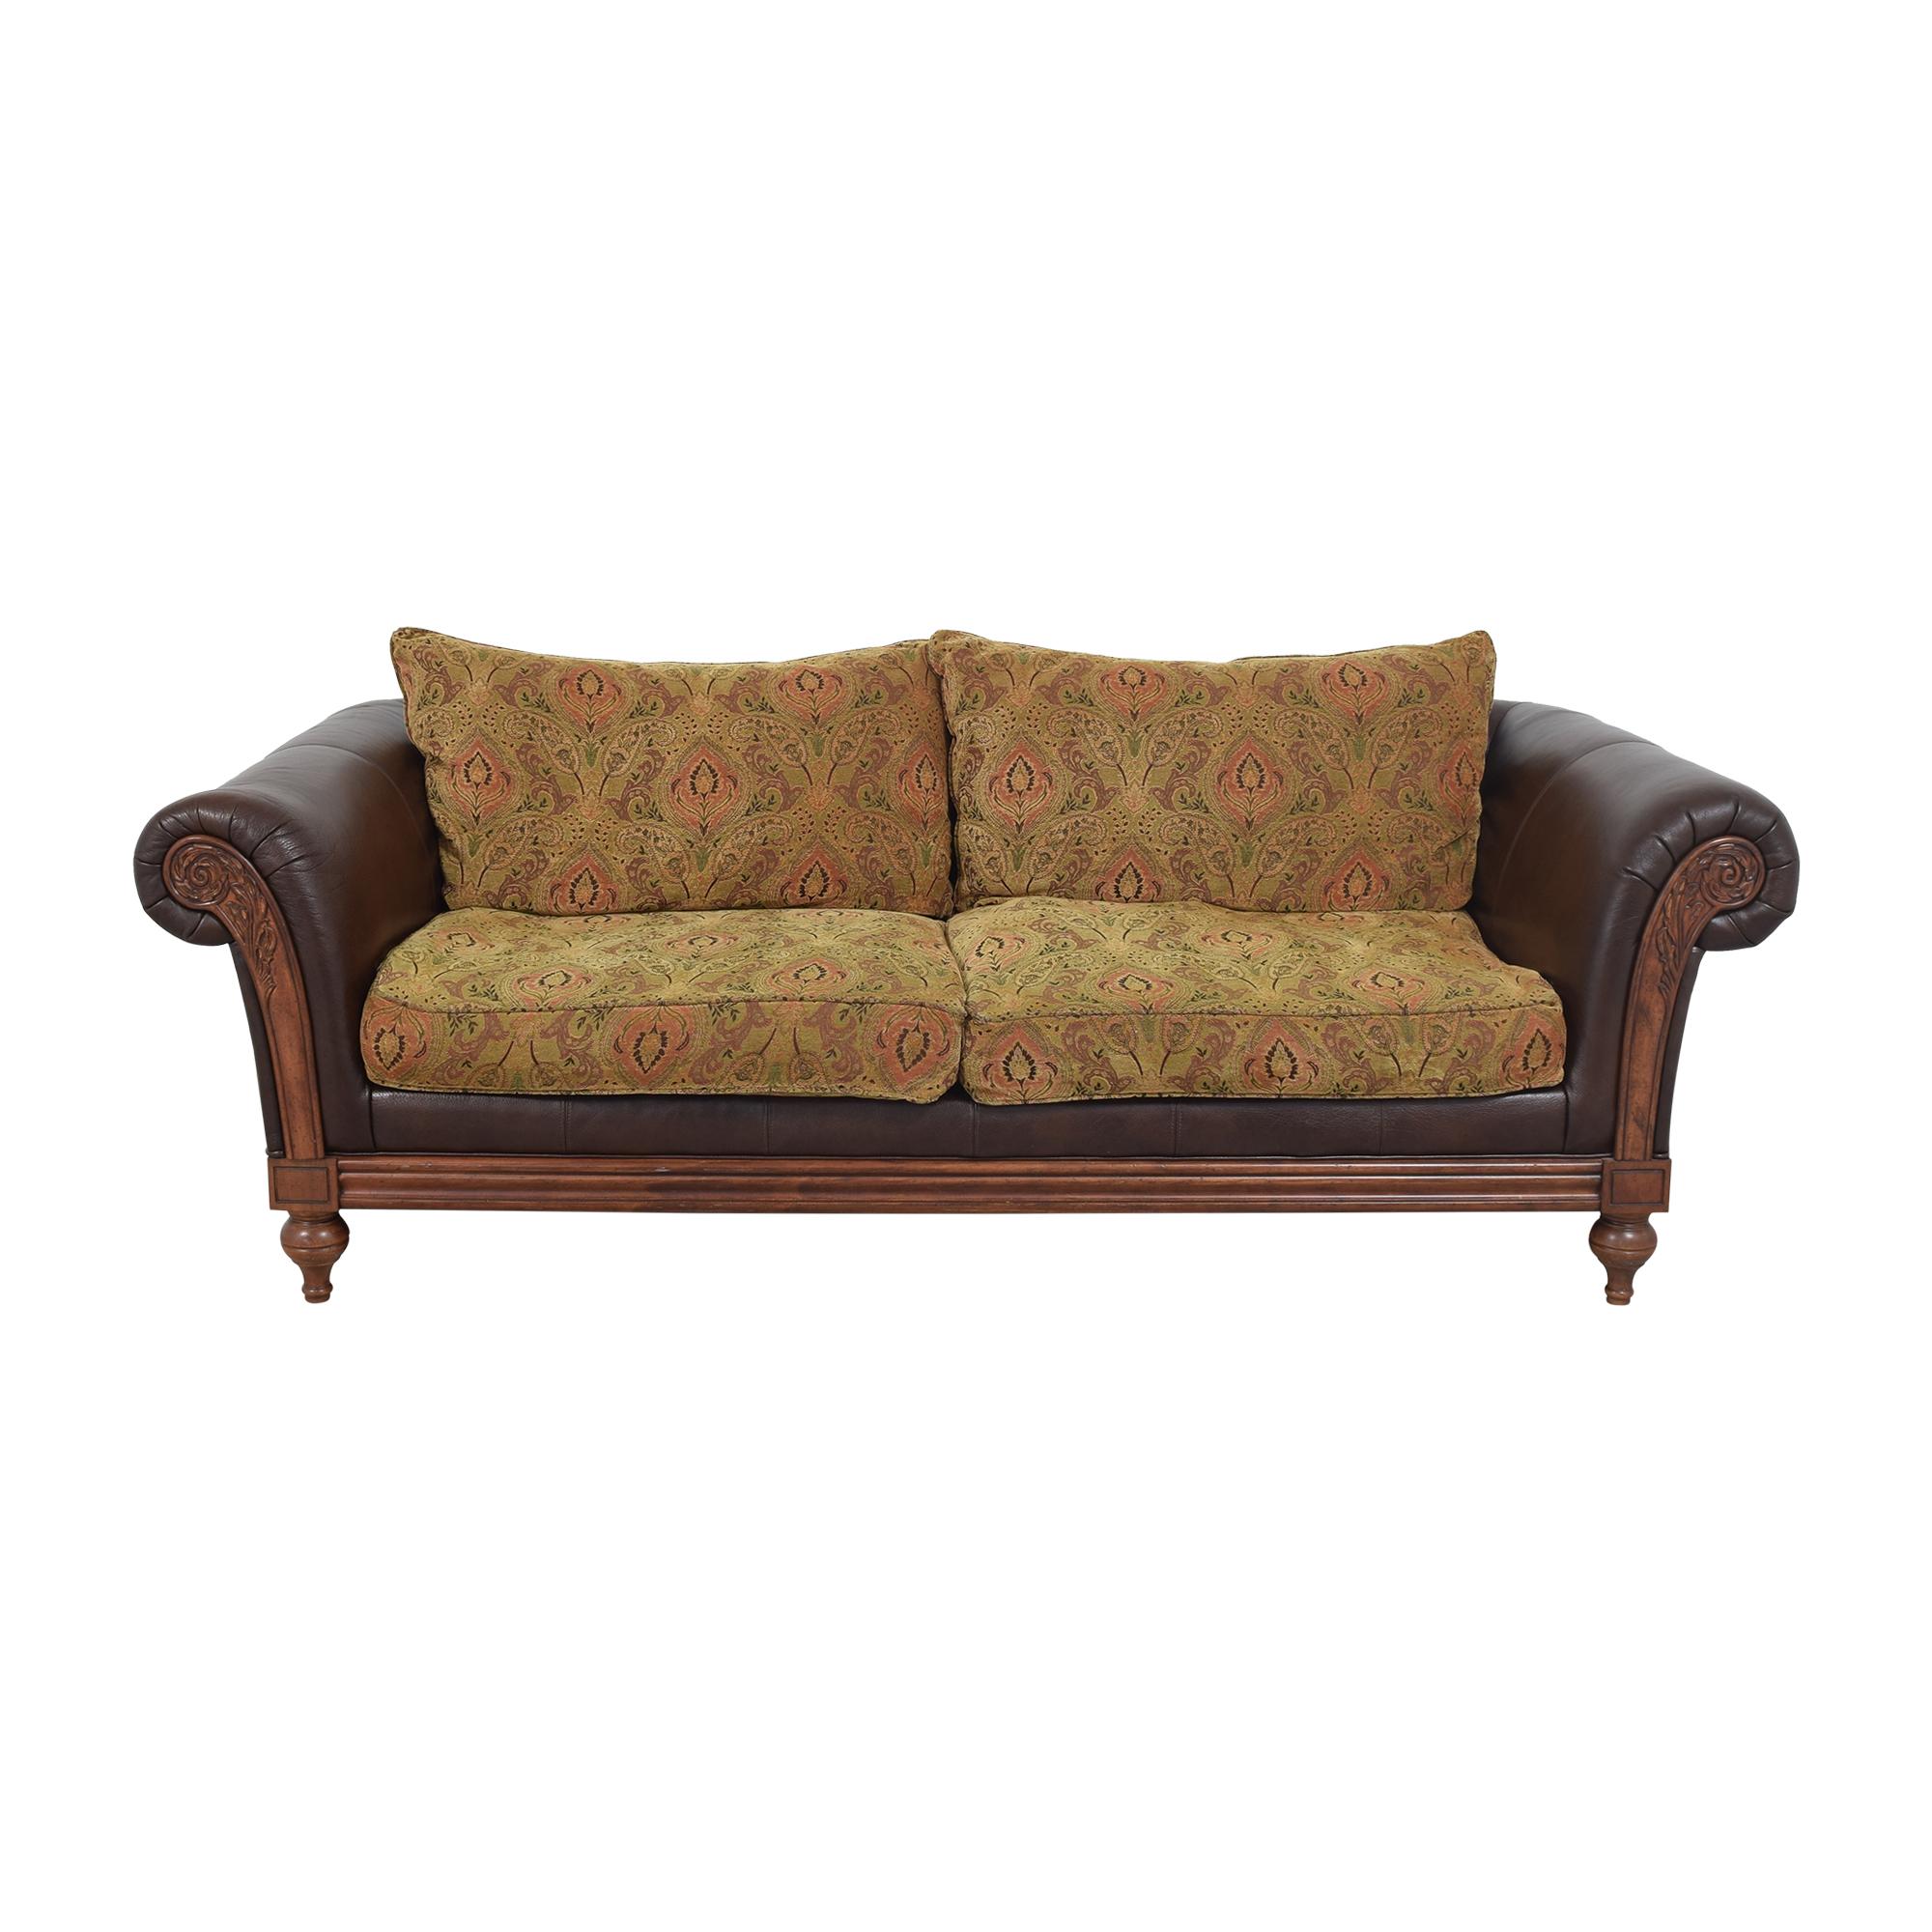 Ethan Allen Ethan Allen Pratt Sofa Sofas